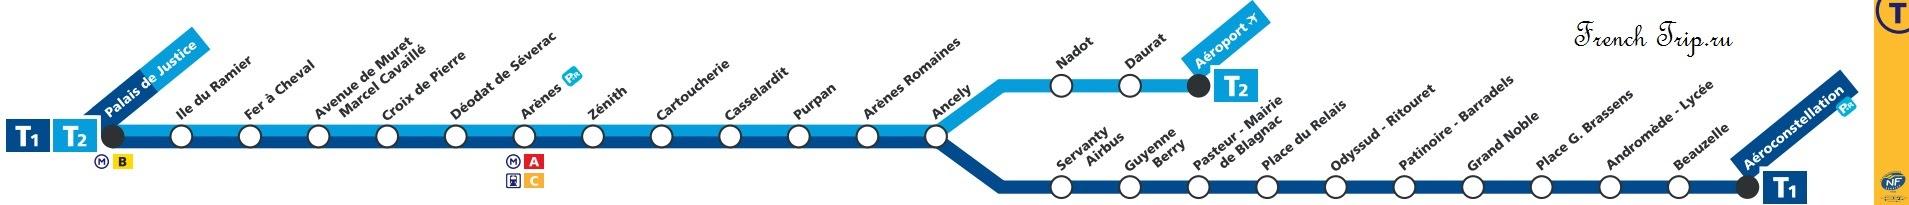 Маршрут трамвая из аэропорта в Тулузу